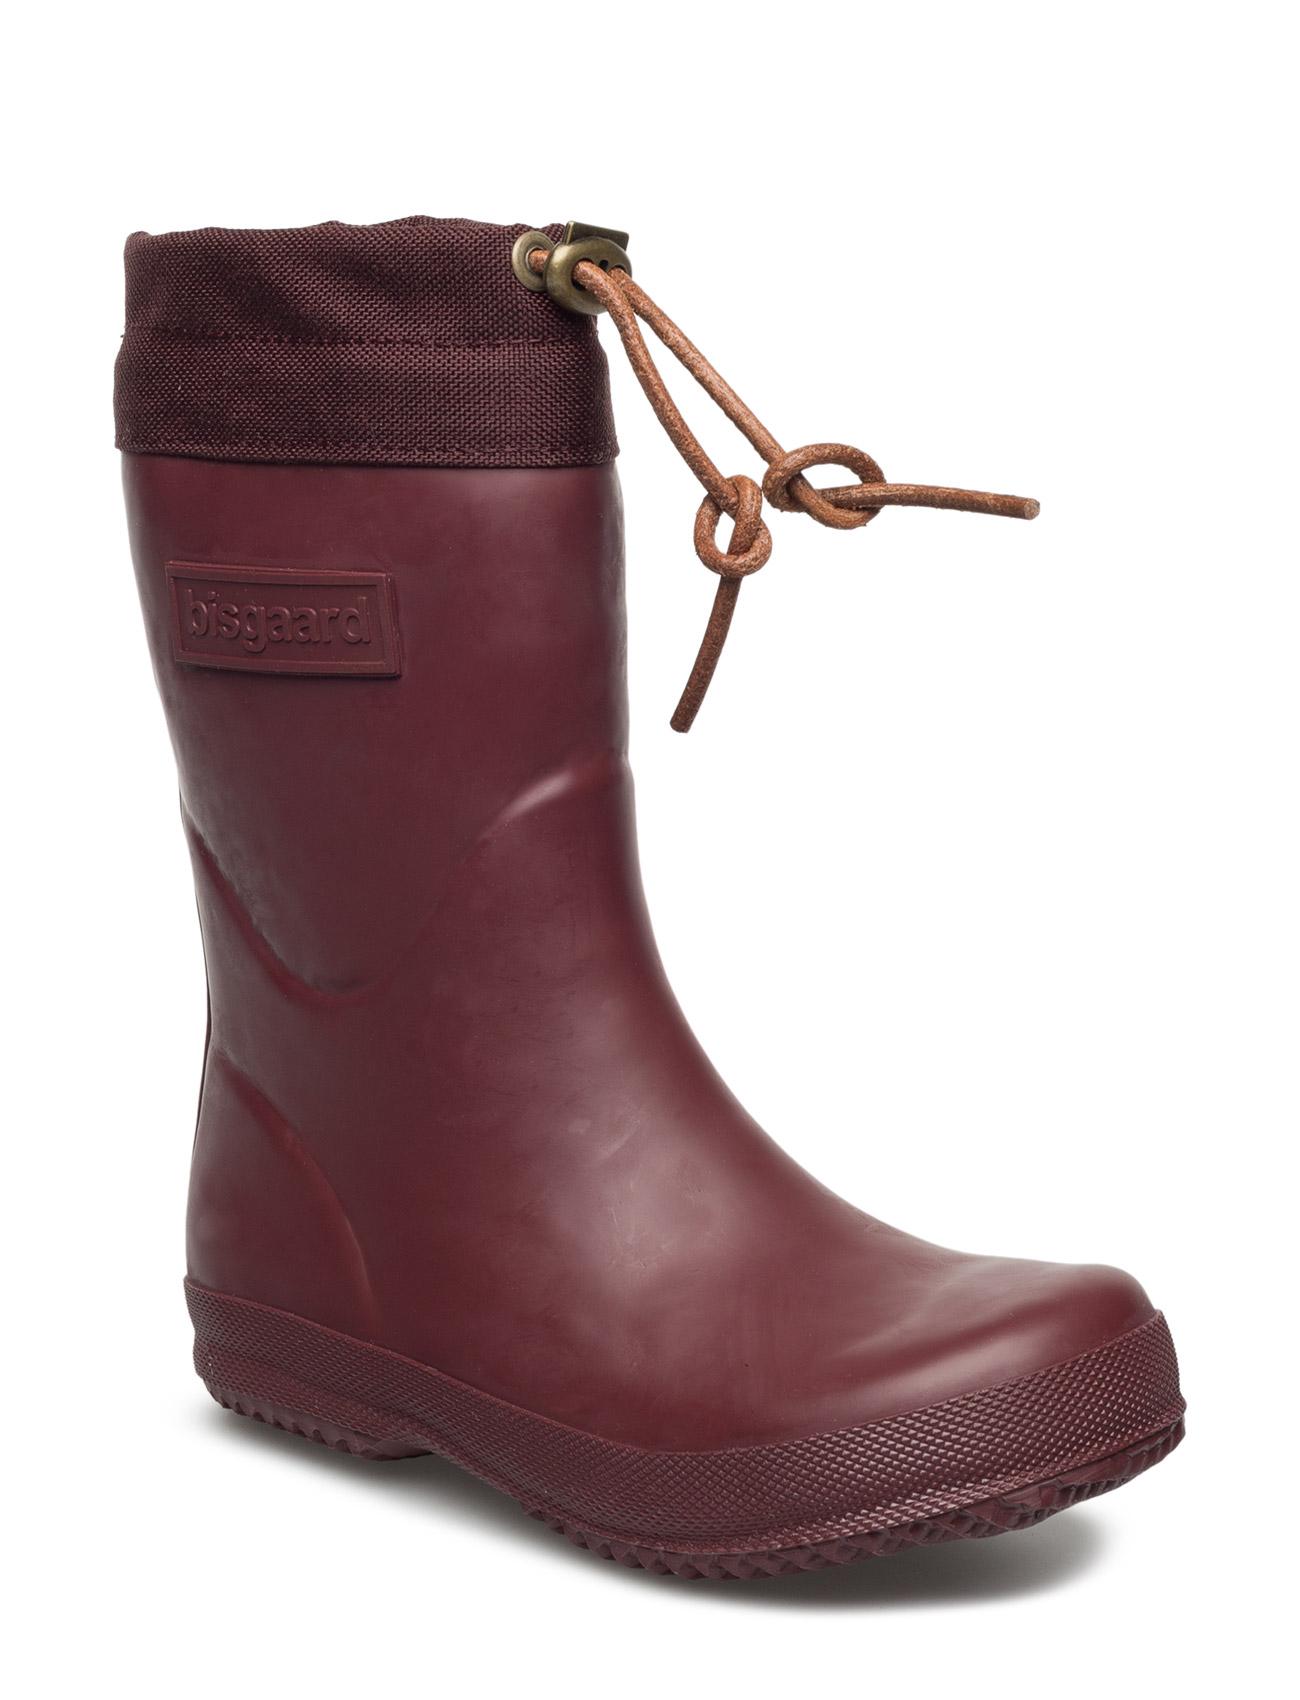 8dbca5bb142 Bisgaard gummistøvler – Rubber Boot - Winter Thermo til børn i Grå ...